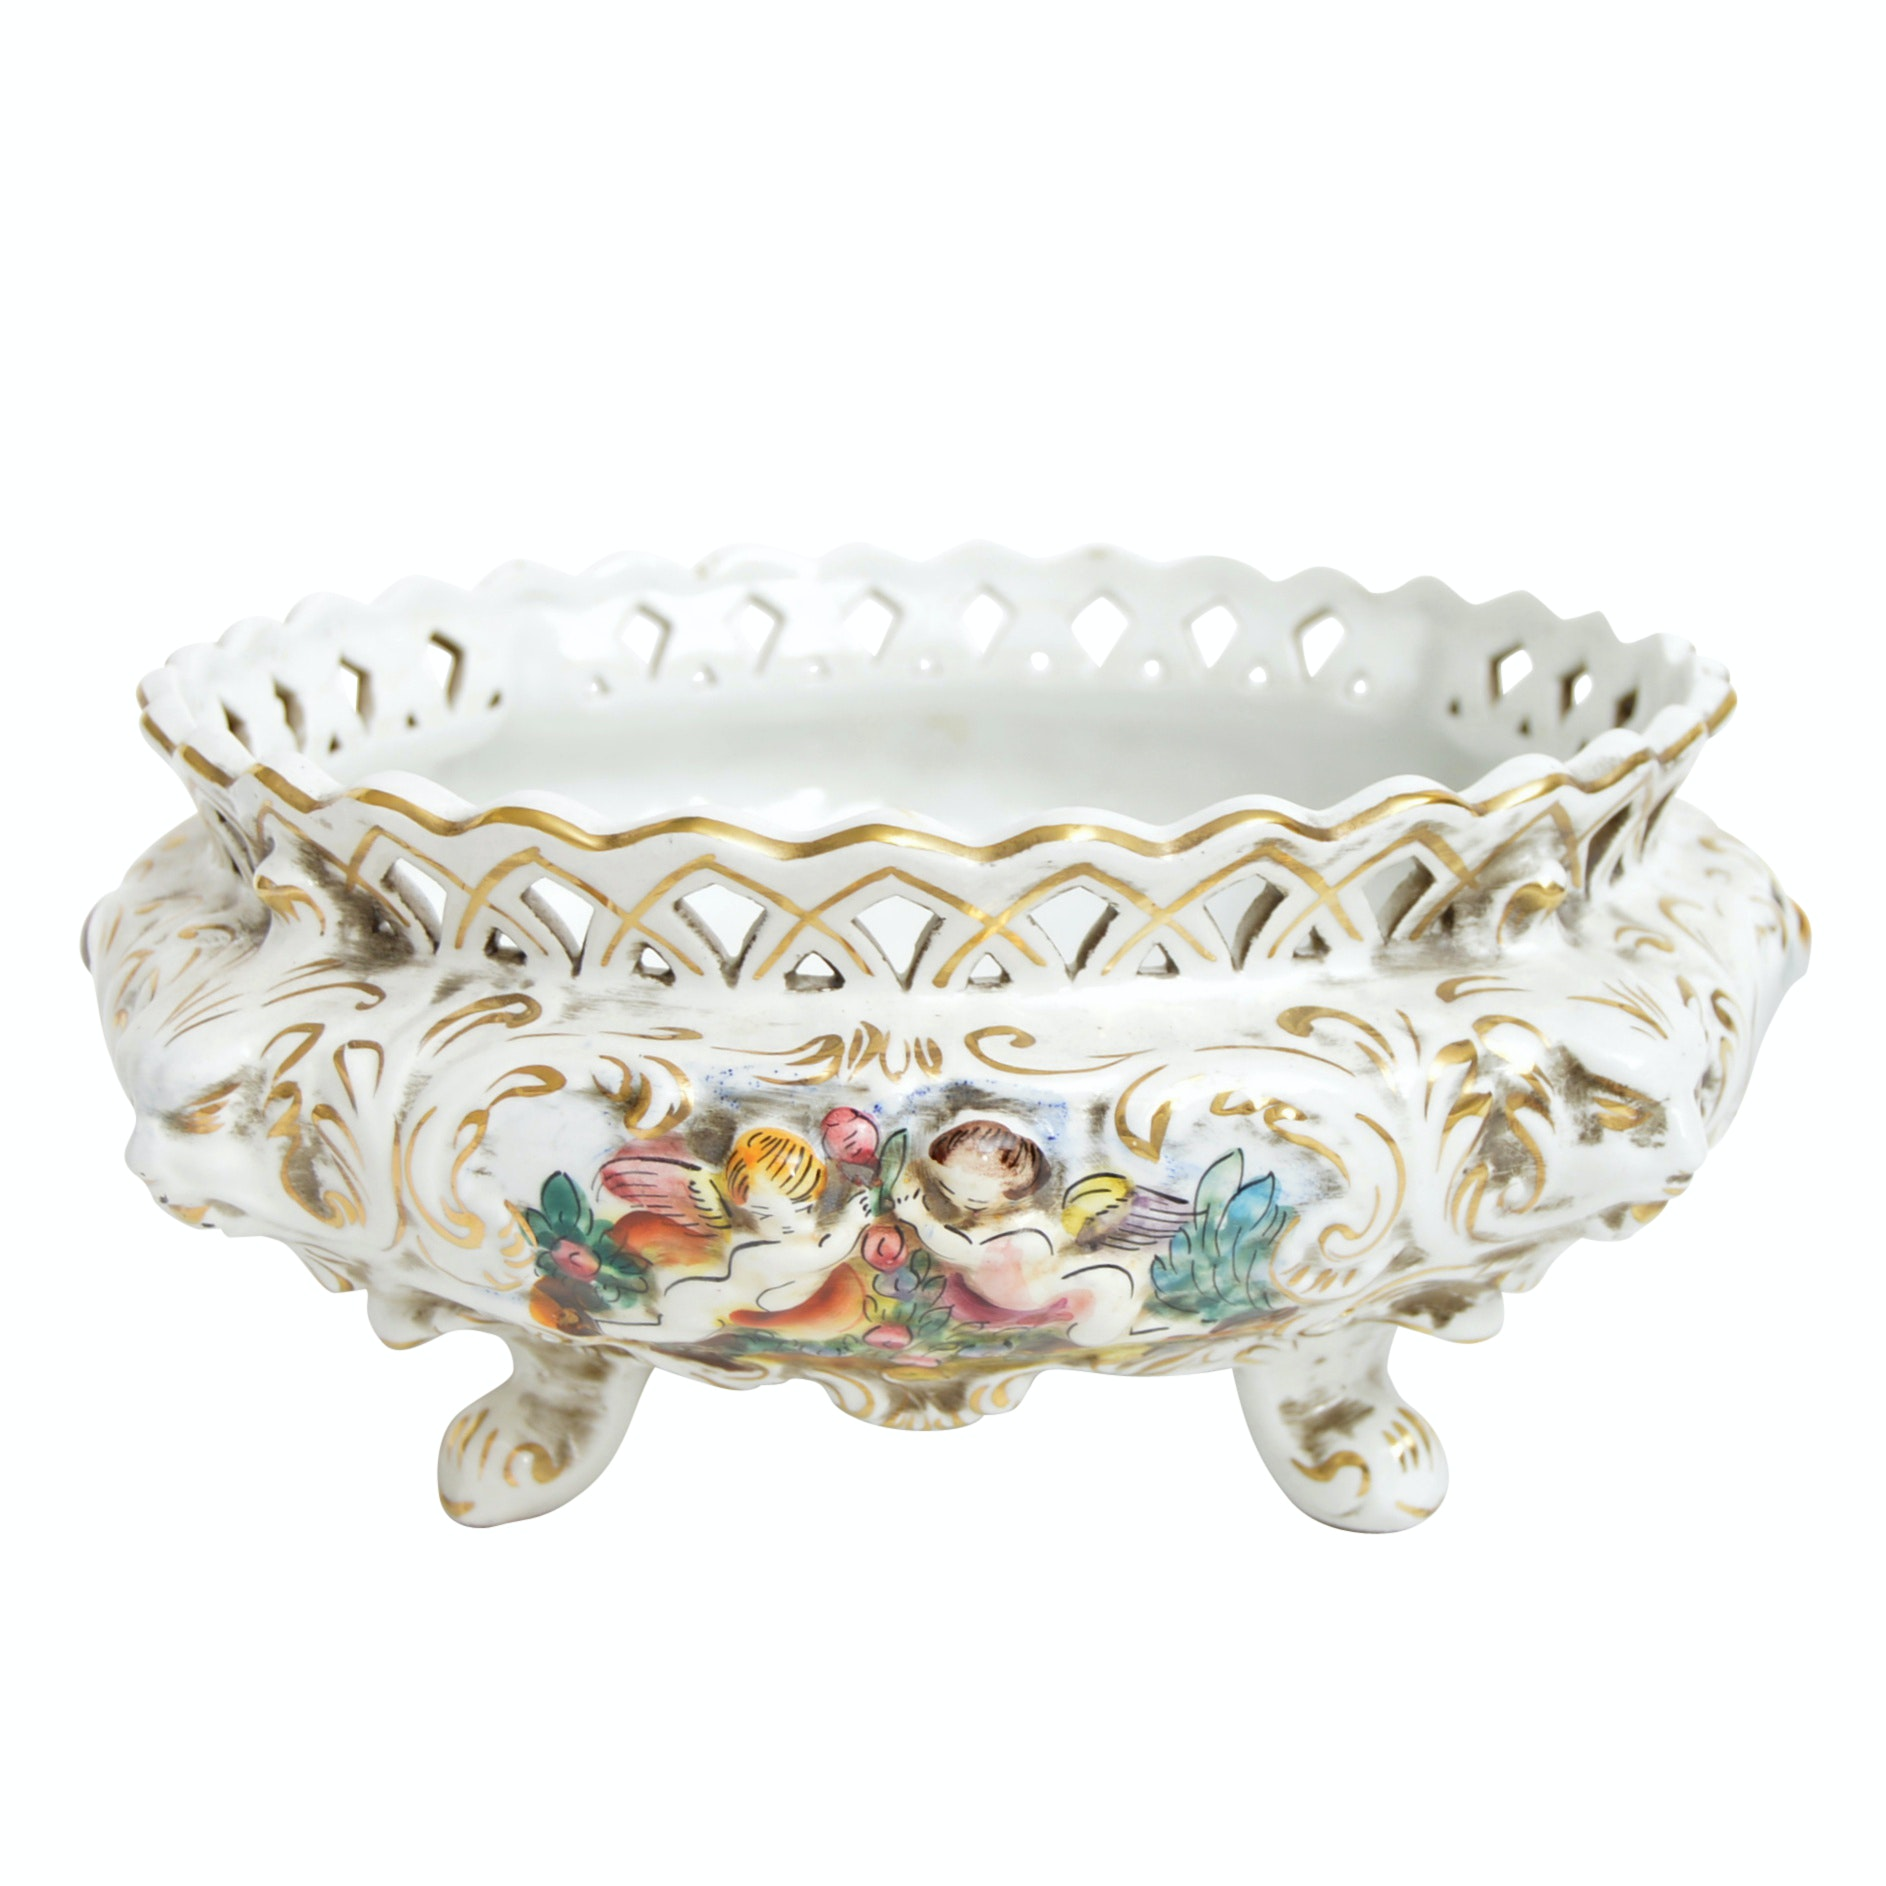 Italian Keramos Capodimonte Hand-Painted Porcelain Oval Bowl